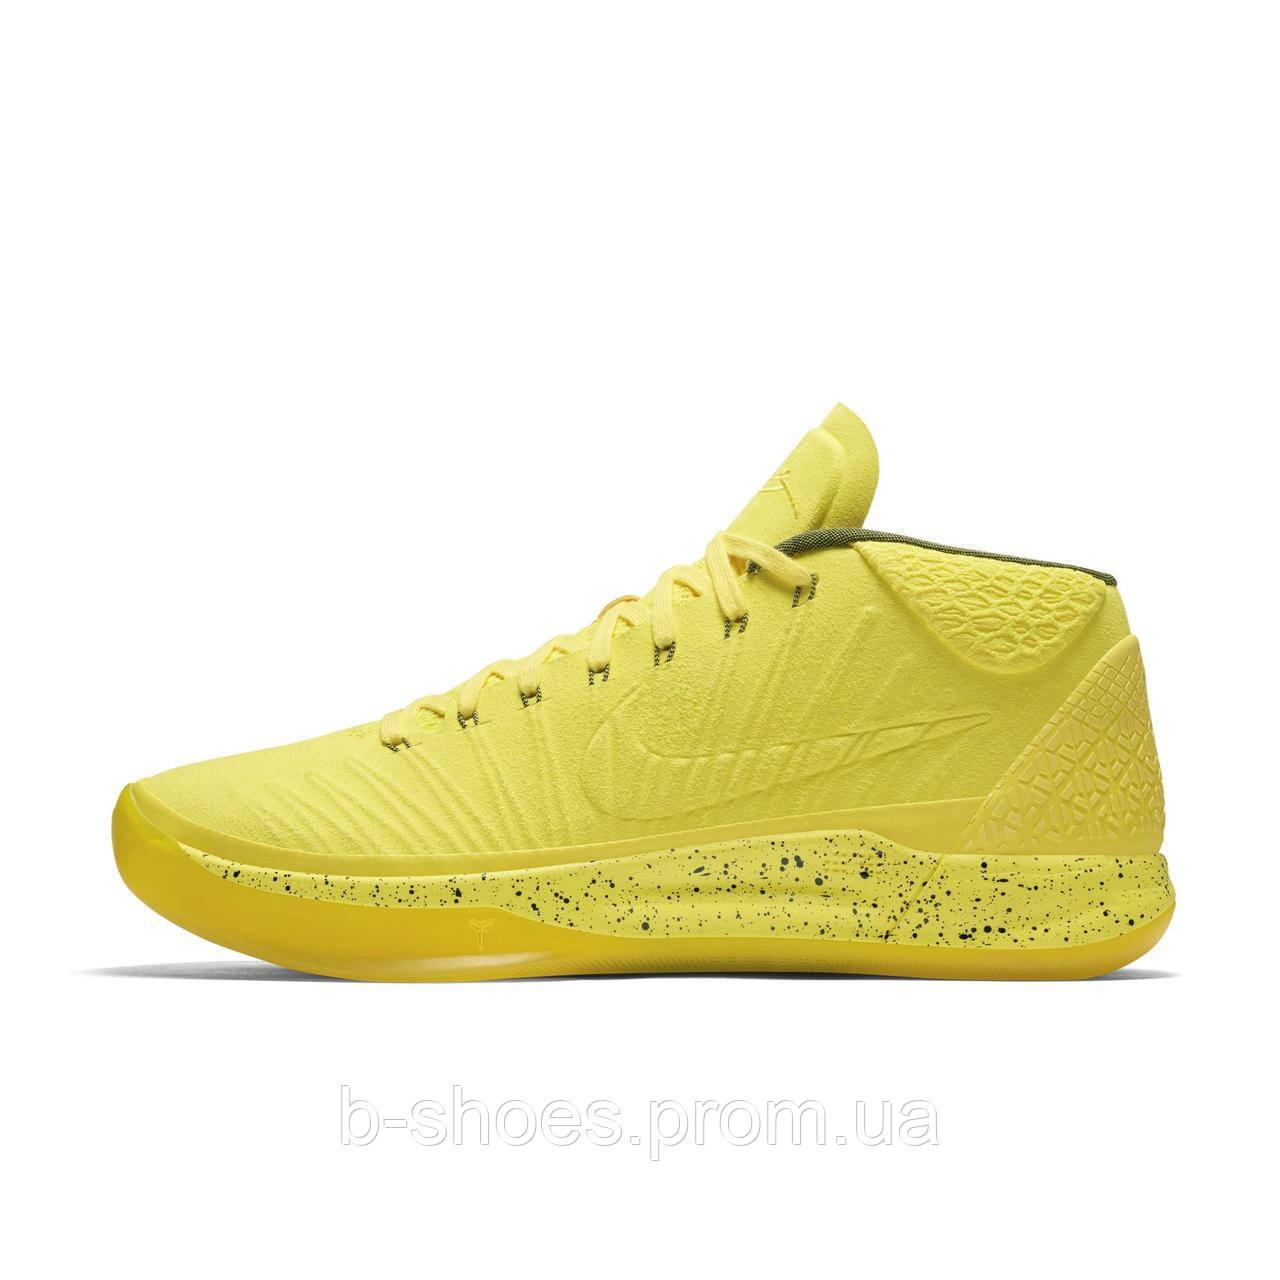 Мужские баскетбольные кроссовки Nike Kobe A.D.Mid Fearless (Yellow)